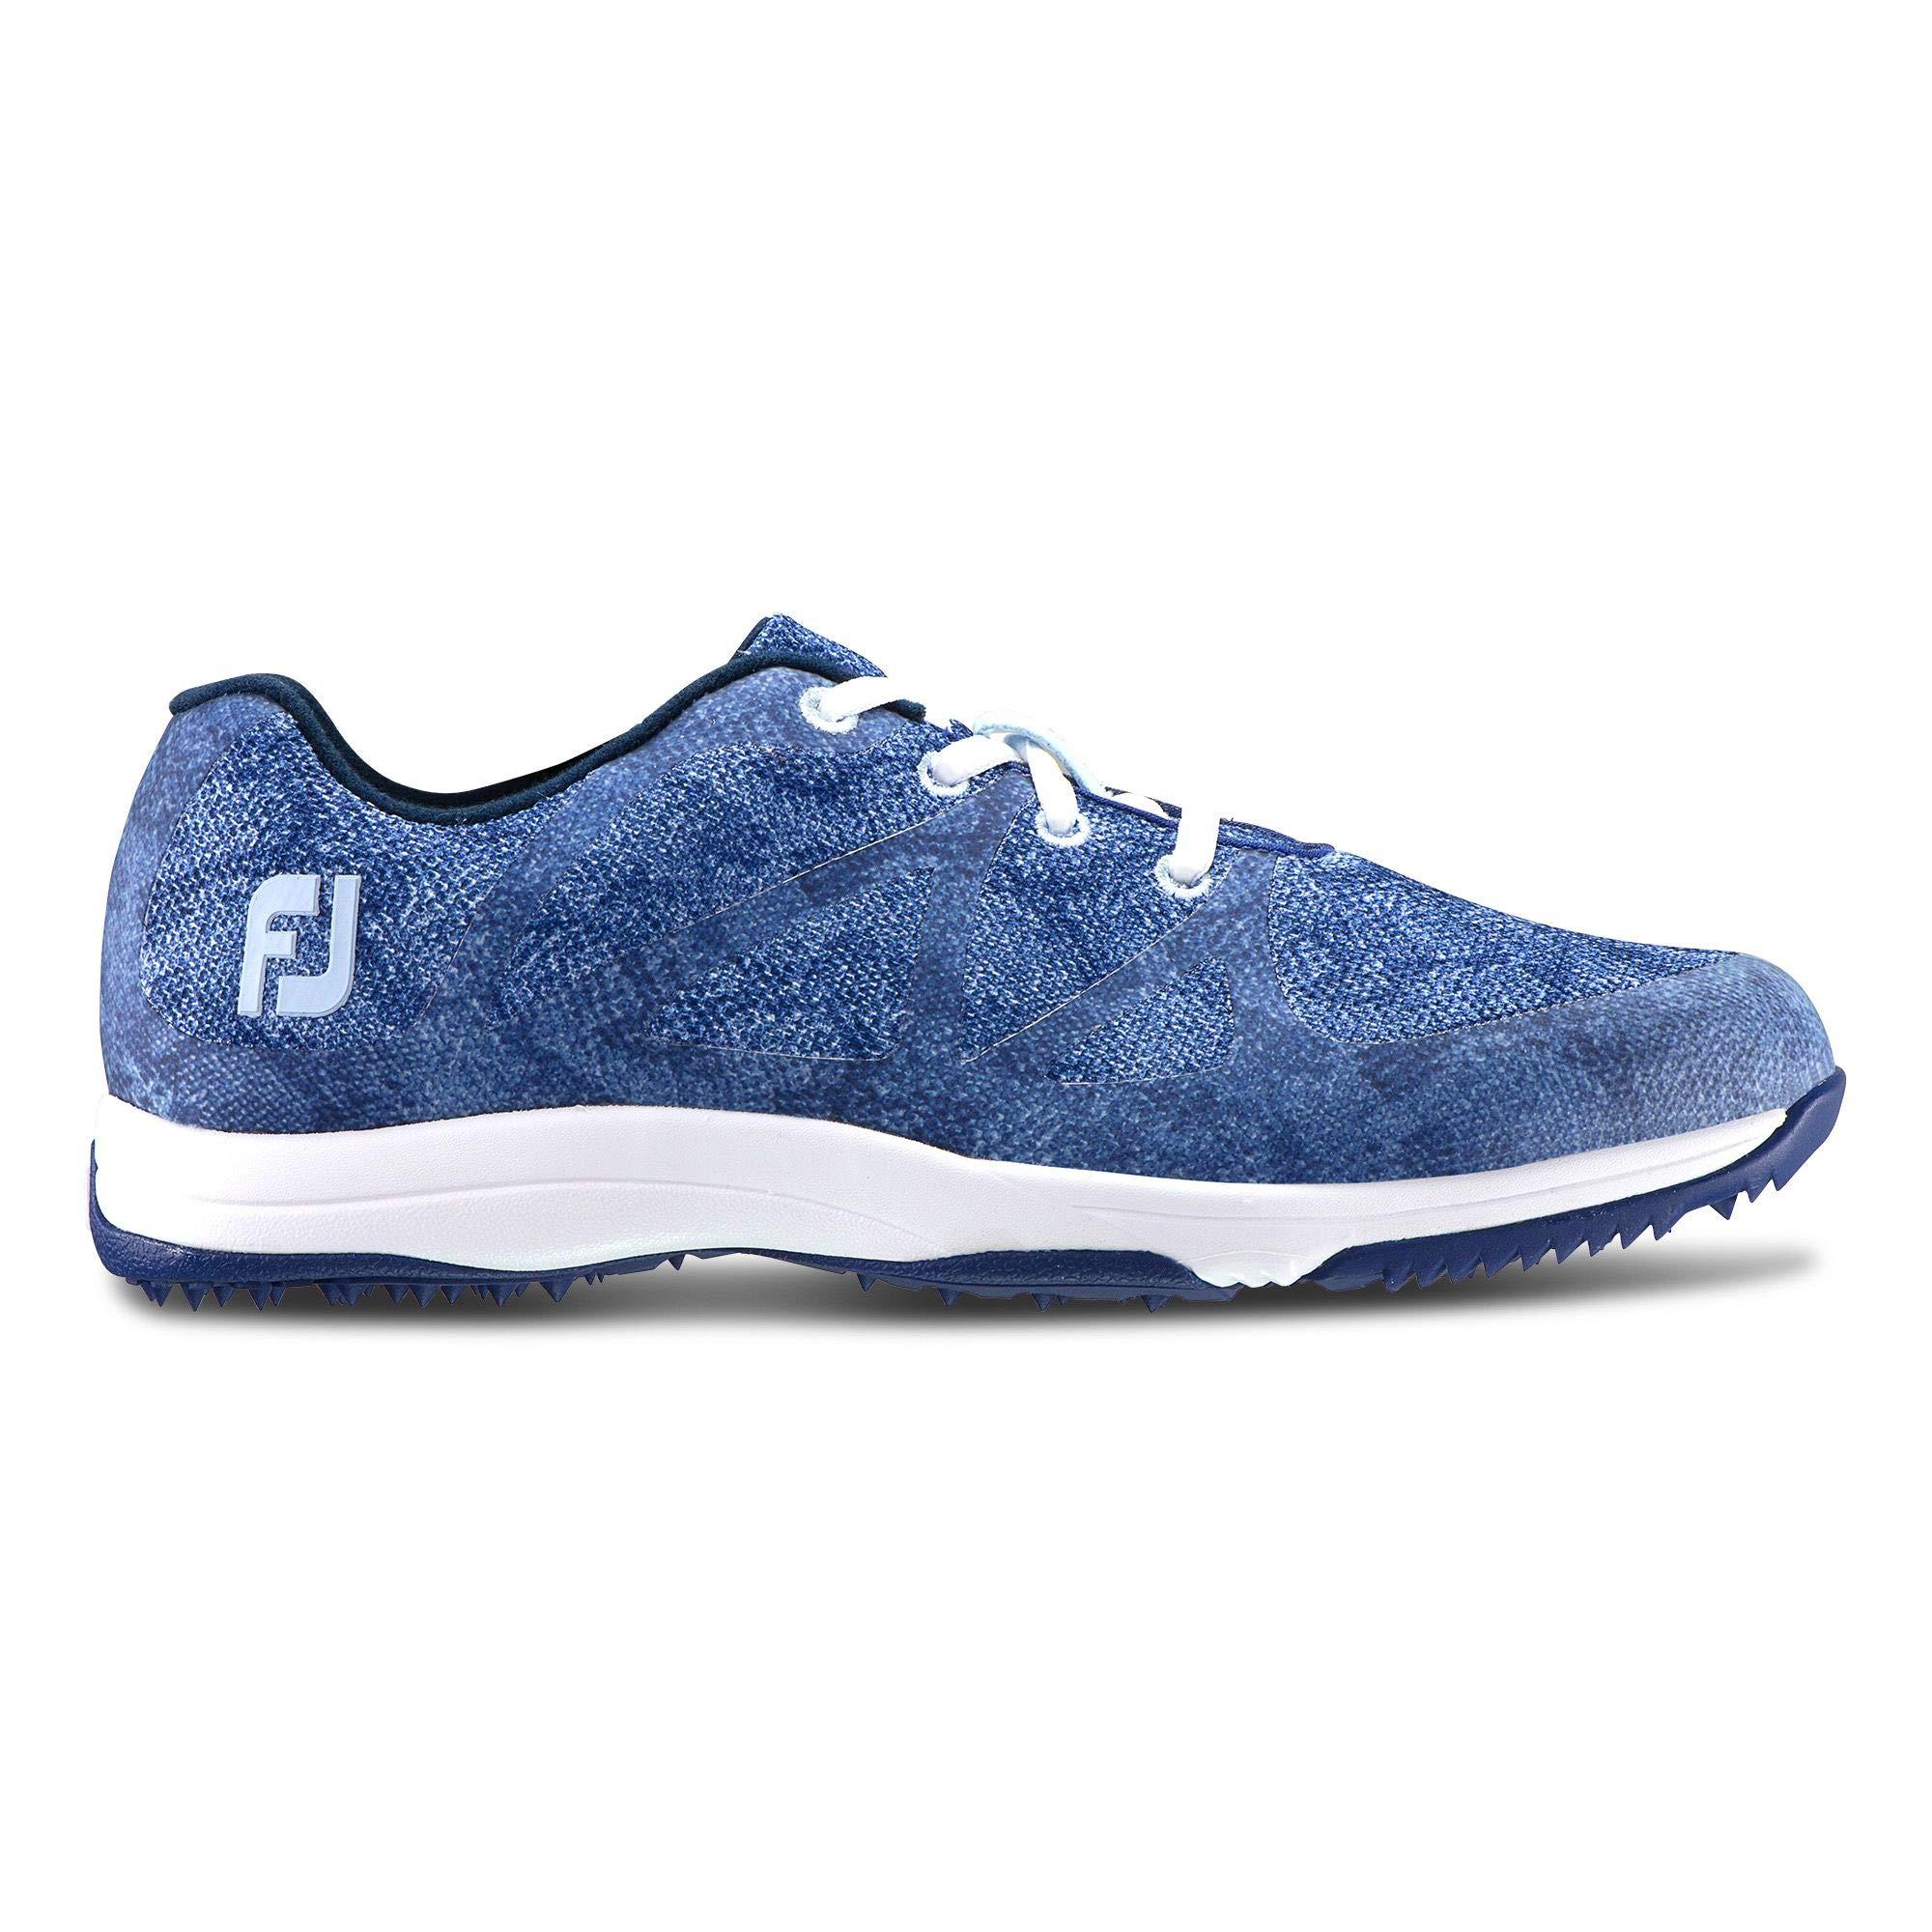 FootJoy Women's Leisure-Previous Season Style Golf Shoes Blue 5.5 M US